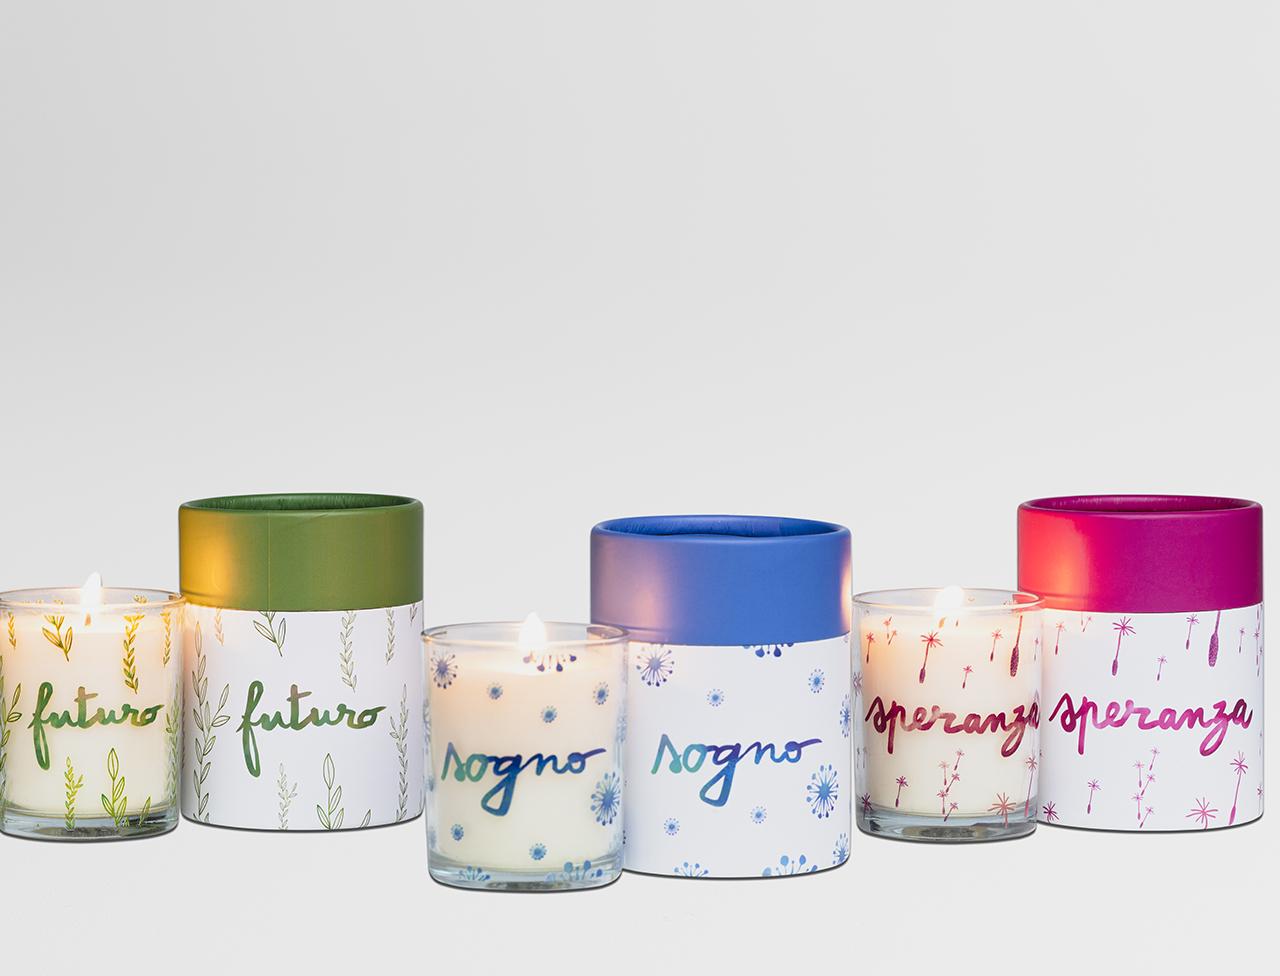 Tris candele profumate